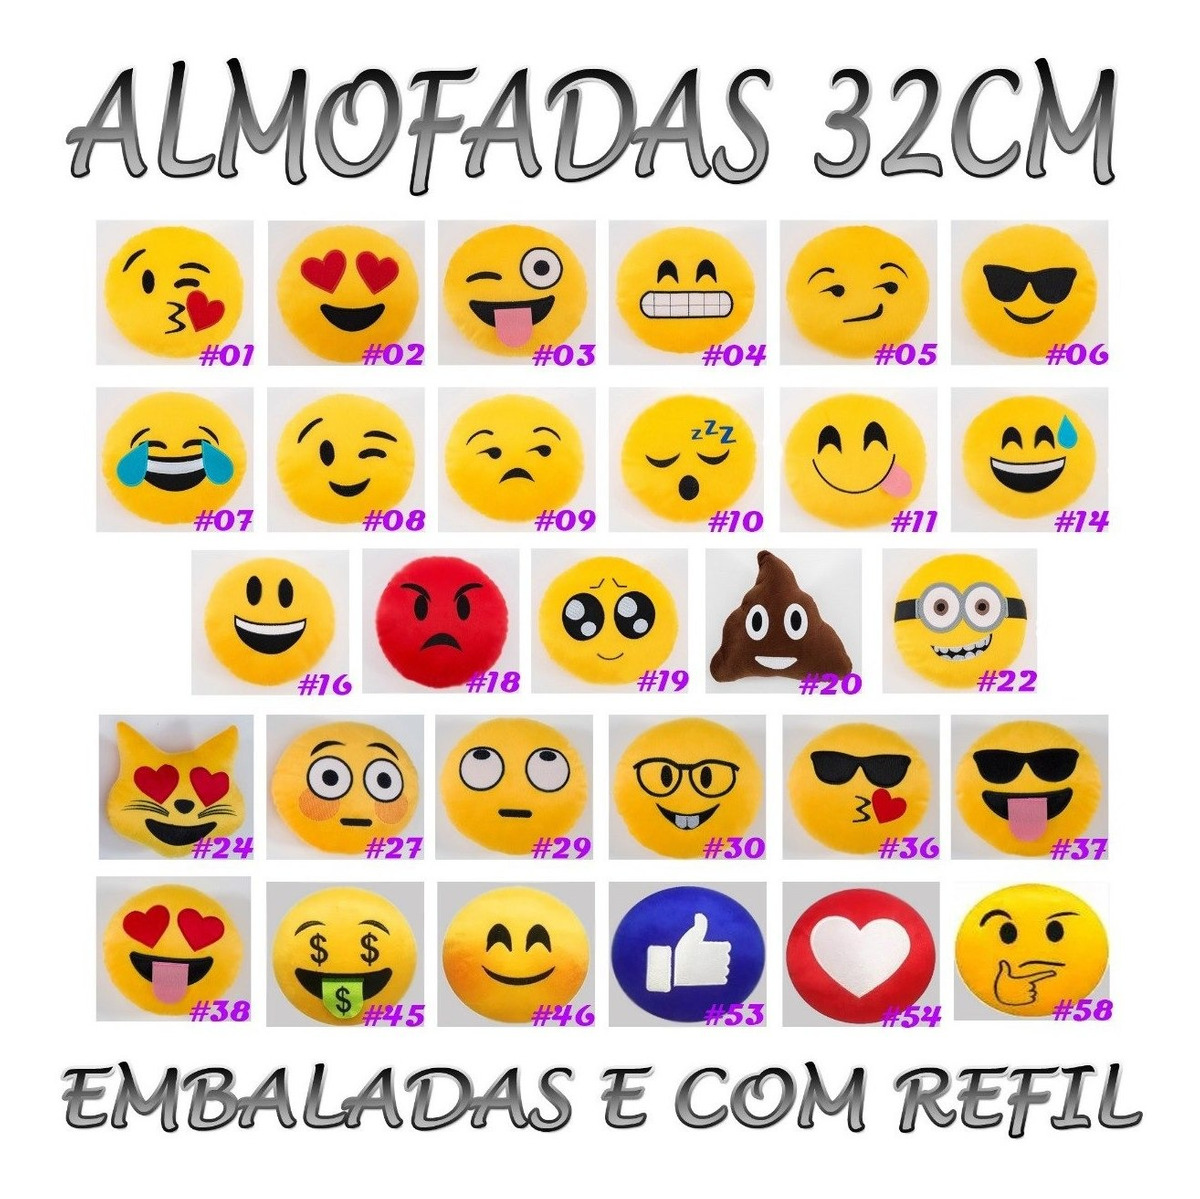 8138ed682a72f4 Kit 6 Almofadas Emoticon Zapzap Watts App Emoji 32cm Bordado